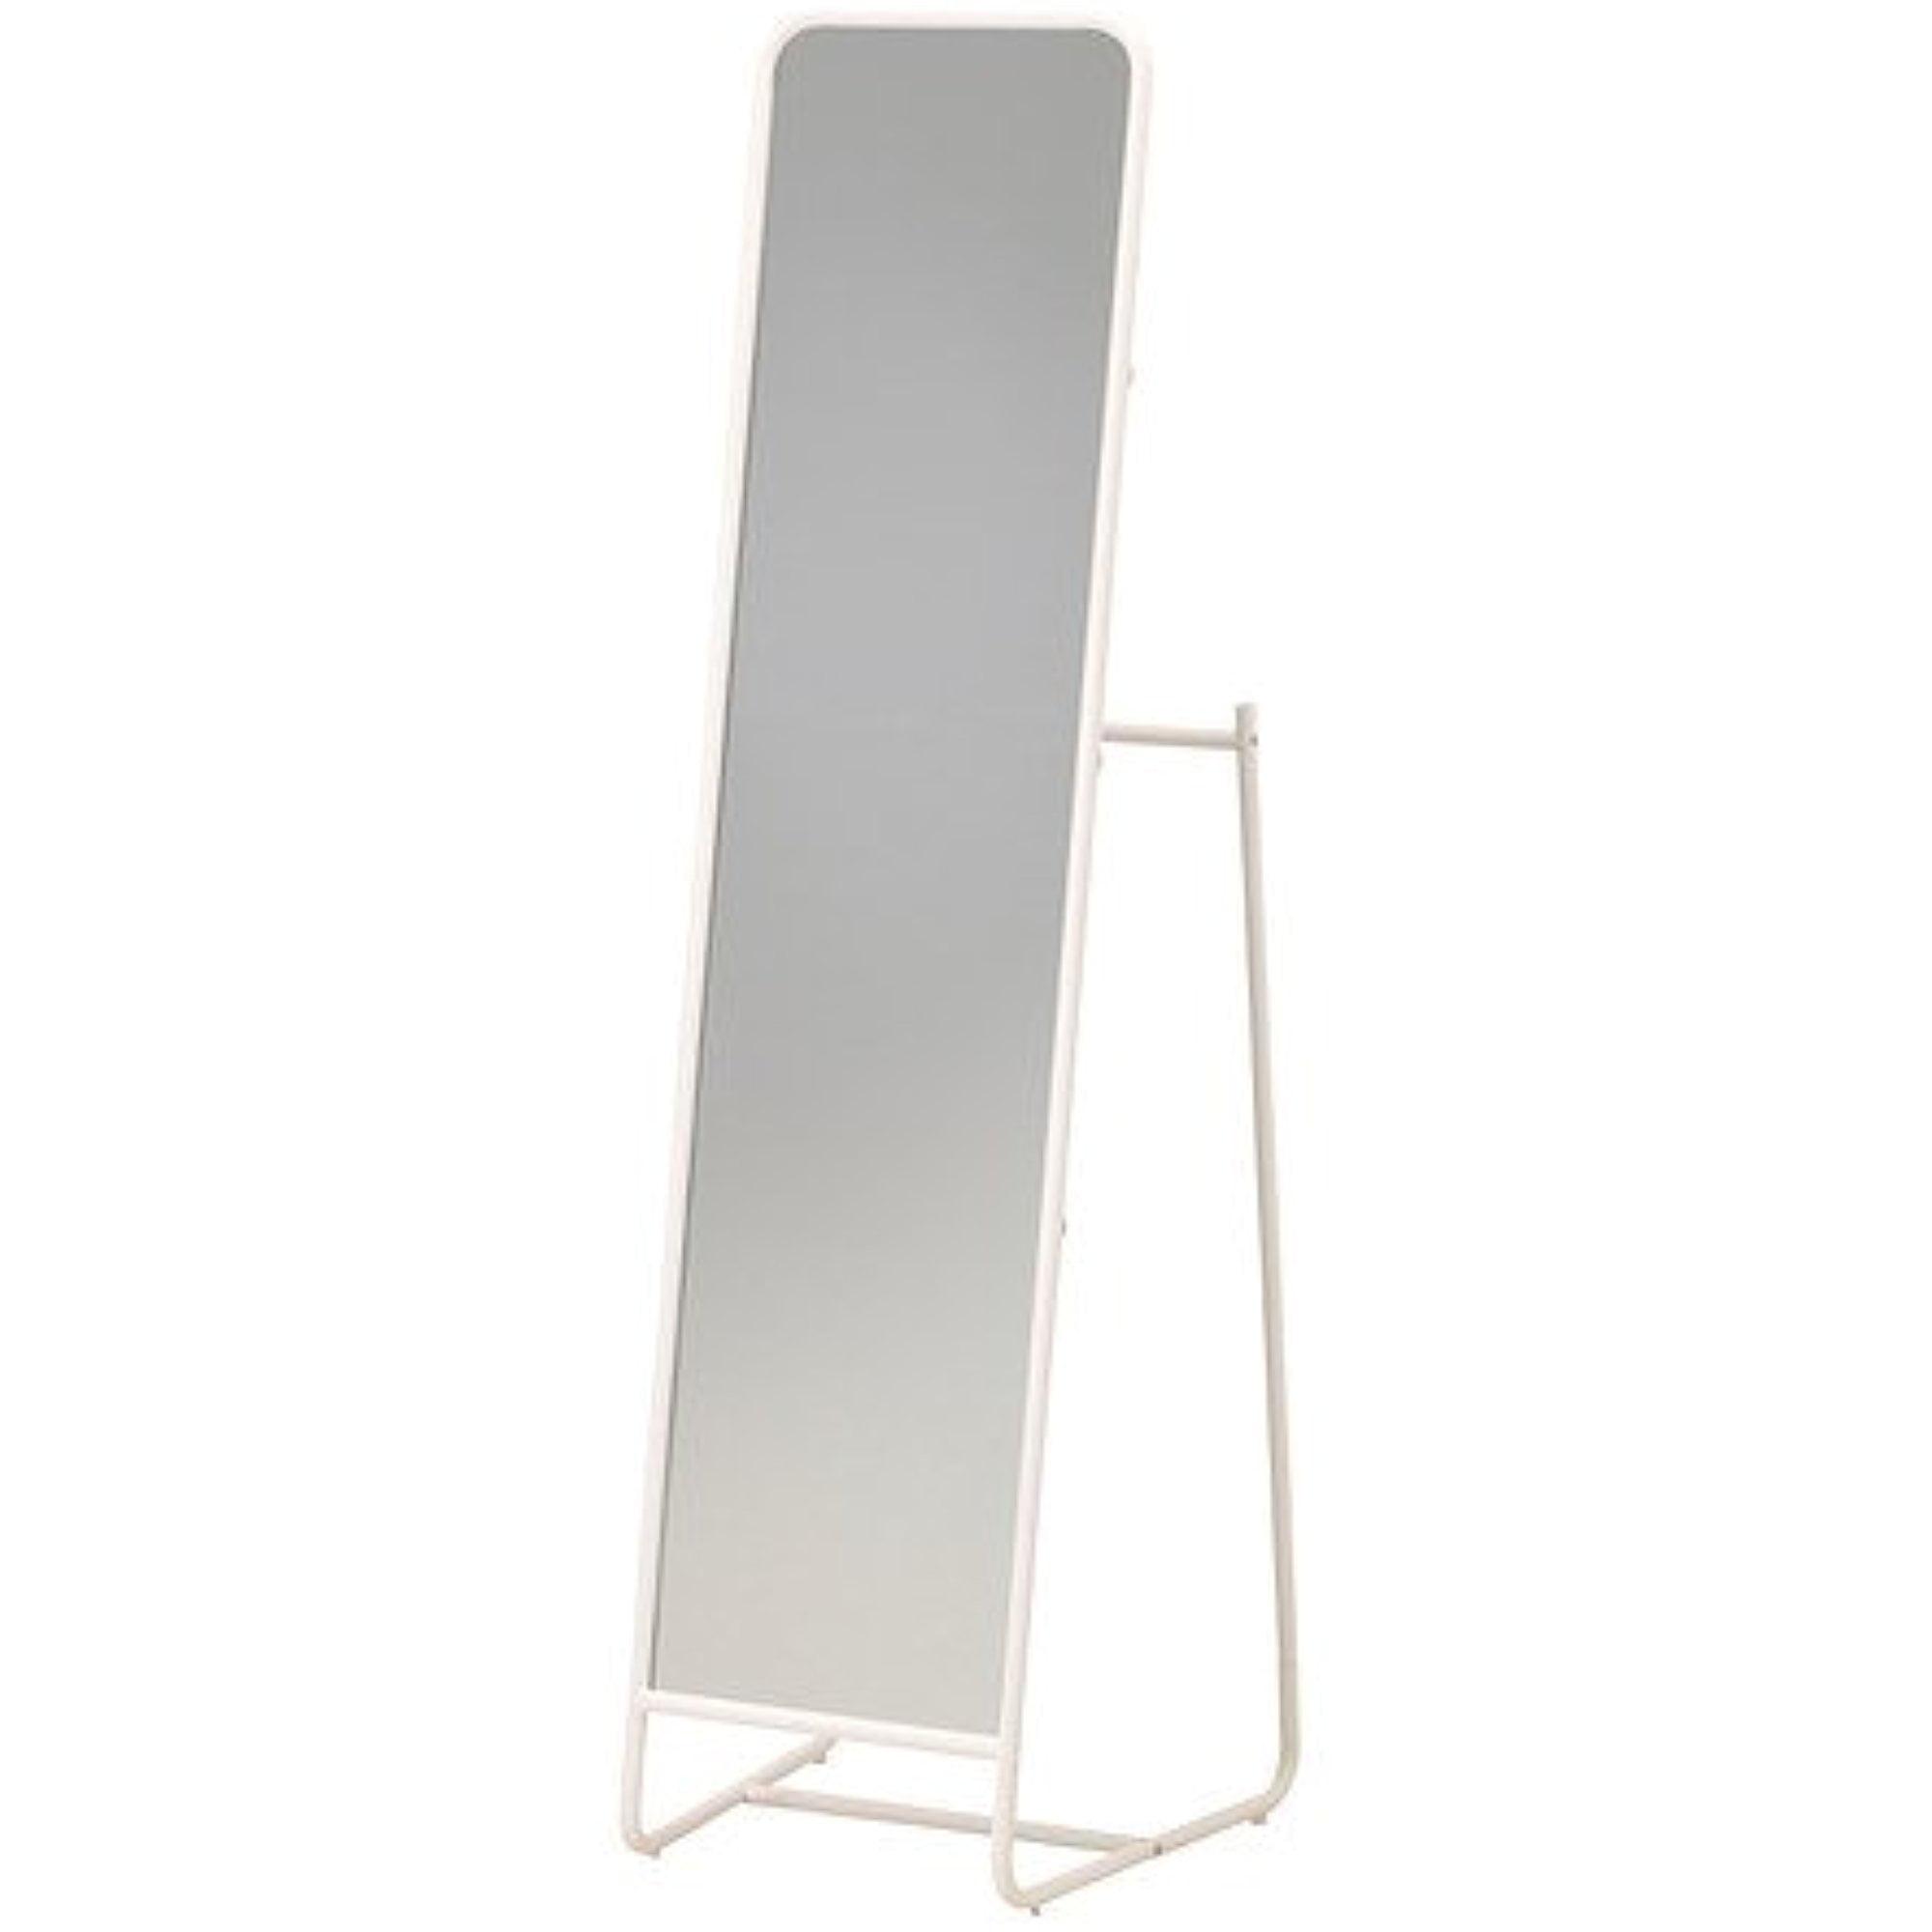 Ikea Floor Mirror White 18 7 8x63 226 52311 3430 Walmart Com Walmart Com